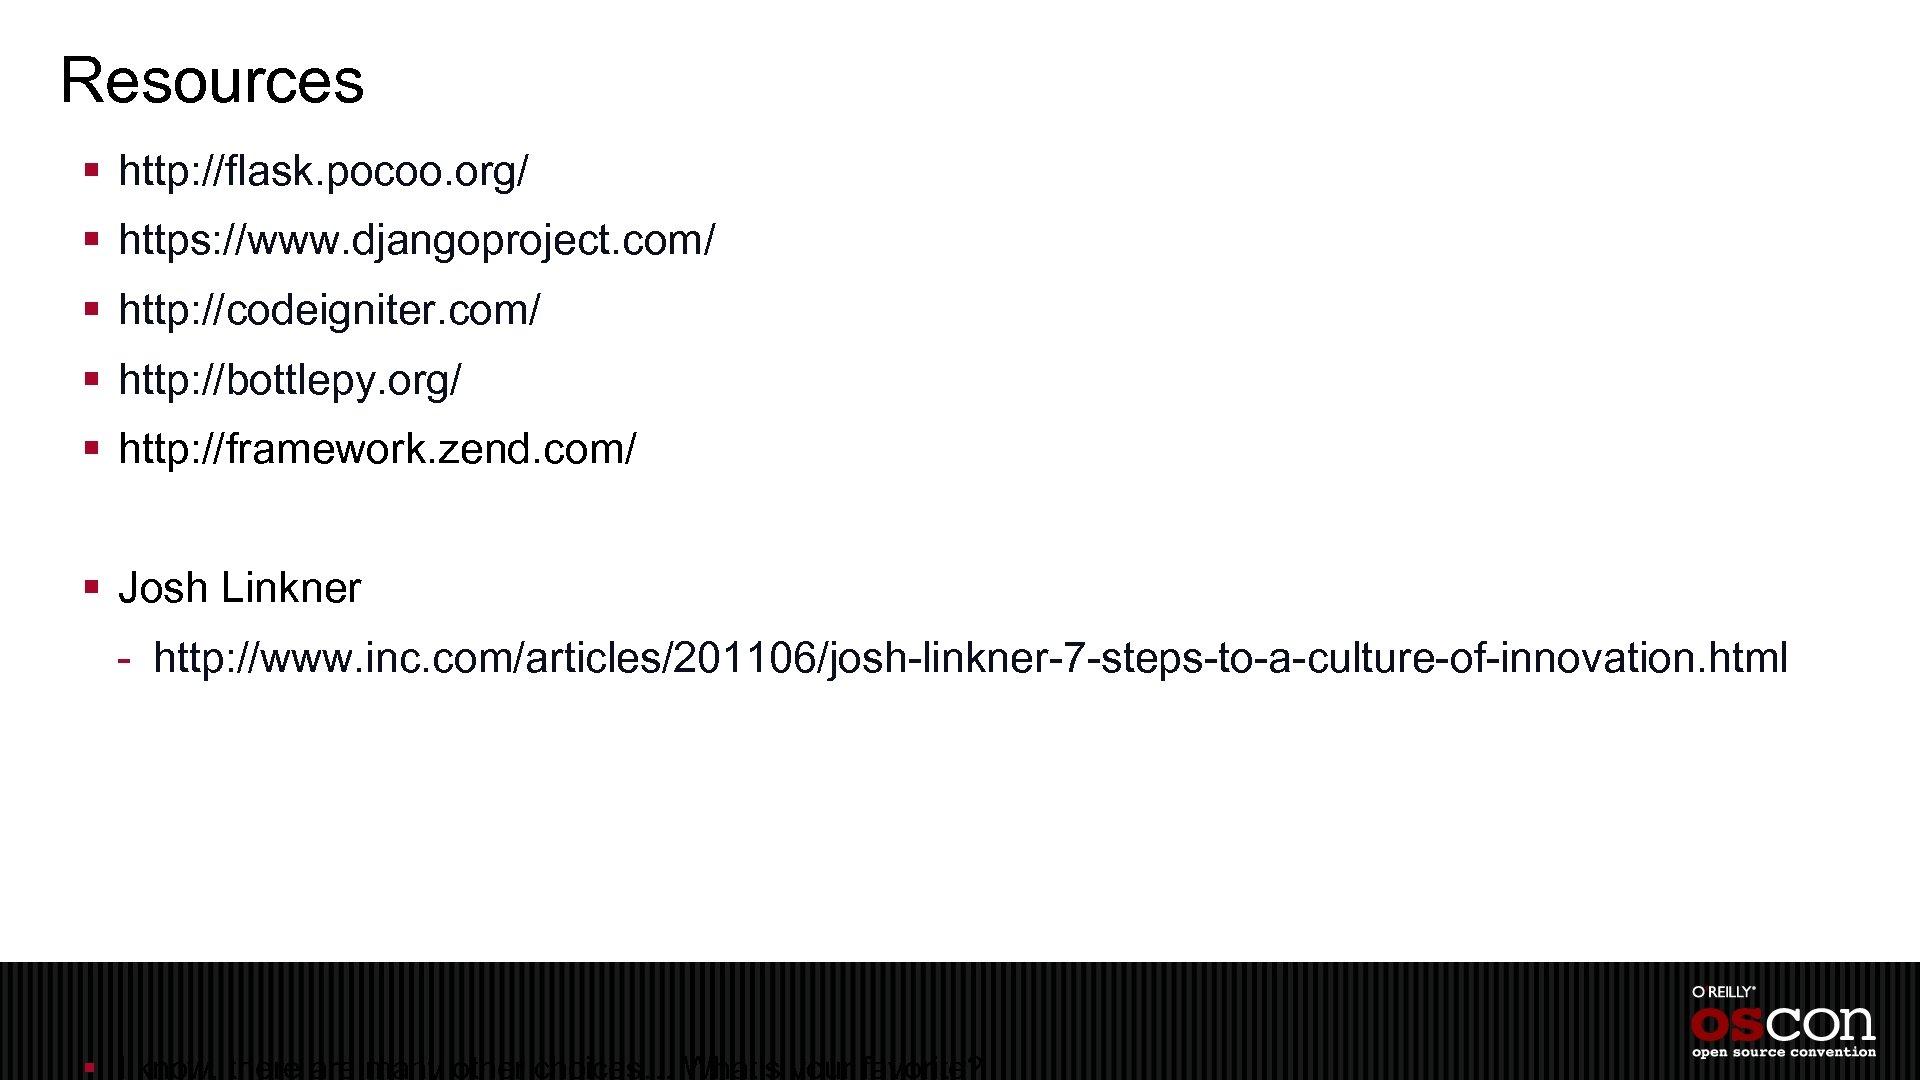 Resources § http: //flask. pocoo. org/ § https: //www. djangoproject. com/ § http: //codeigniter.